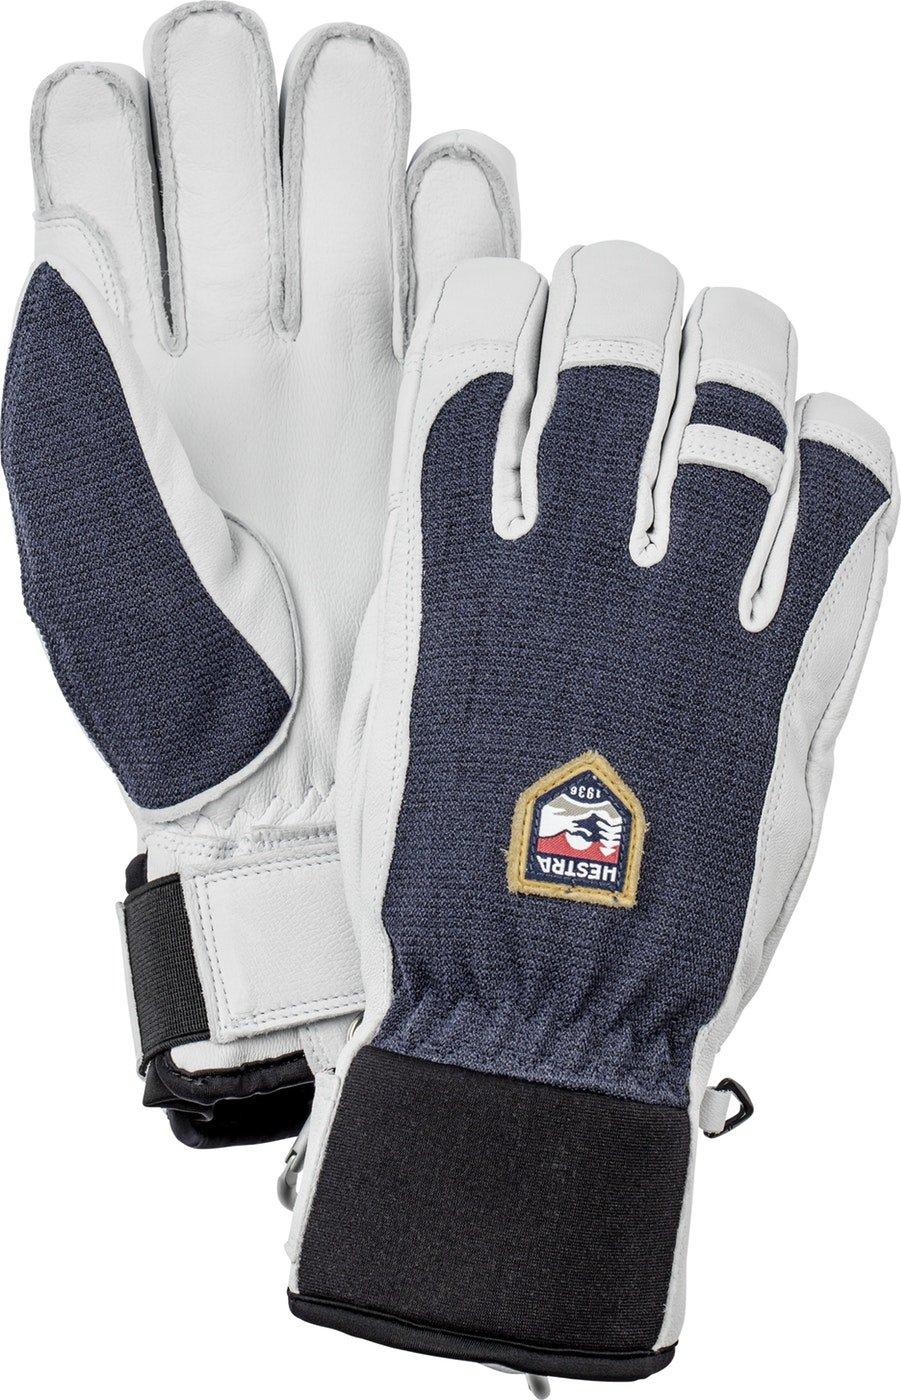 Hestra Army Leather Patrol Glove - Navy